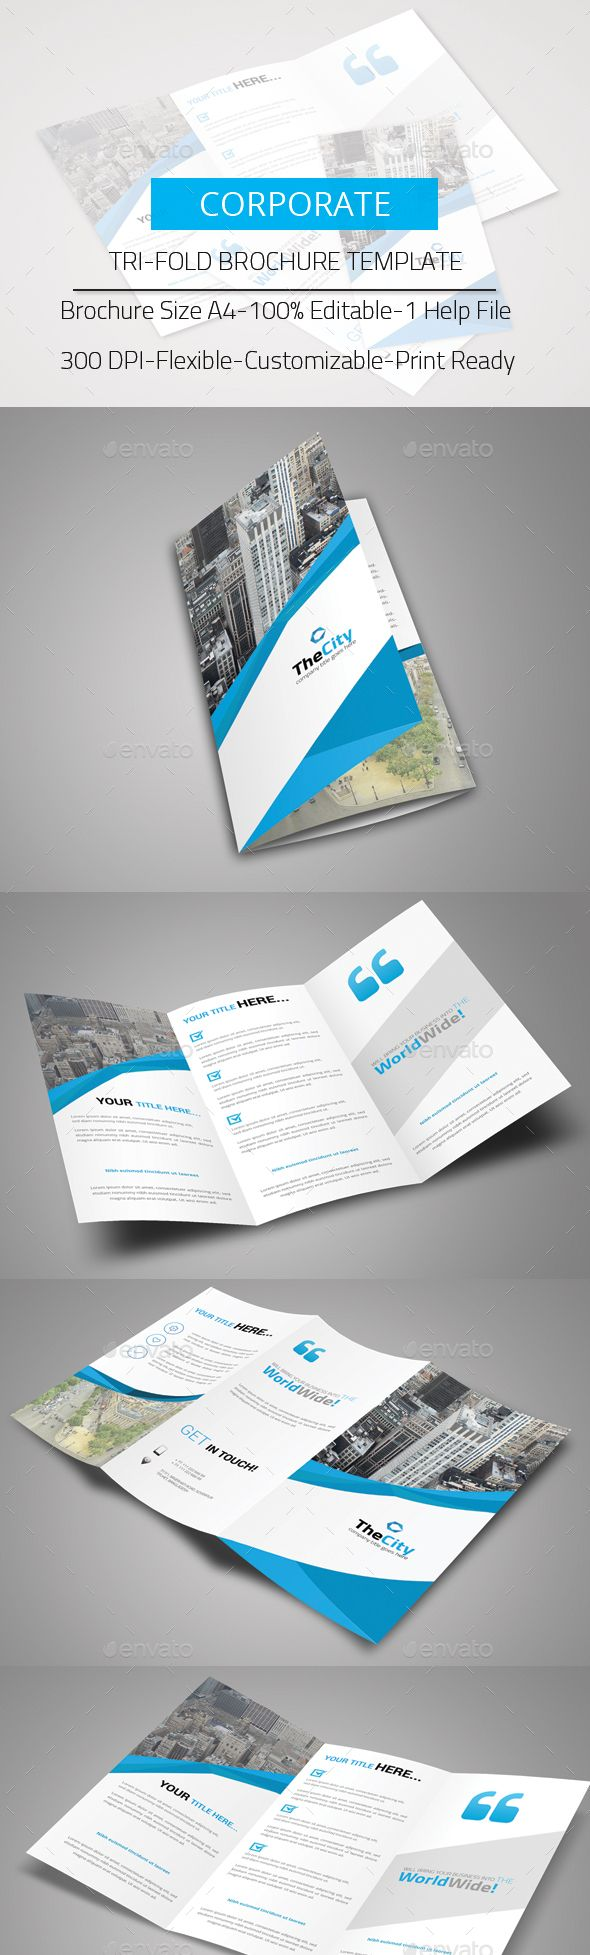 Tri-Fold Brochure Template PSD #design Download: http://graphicriver.net/item/trifold-brochure/13843699?ref=ksioks